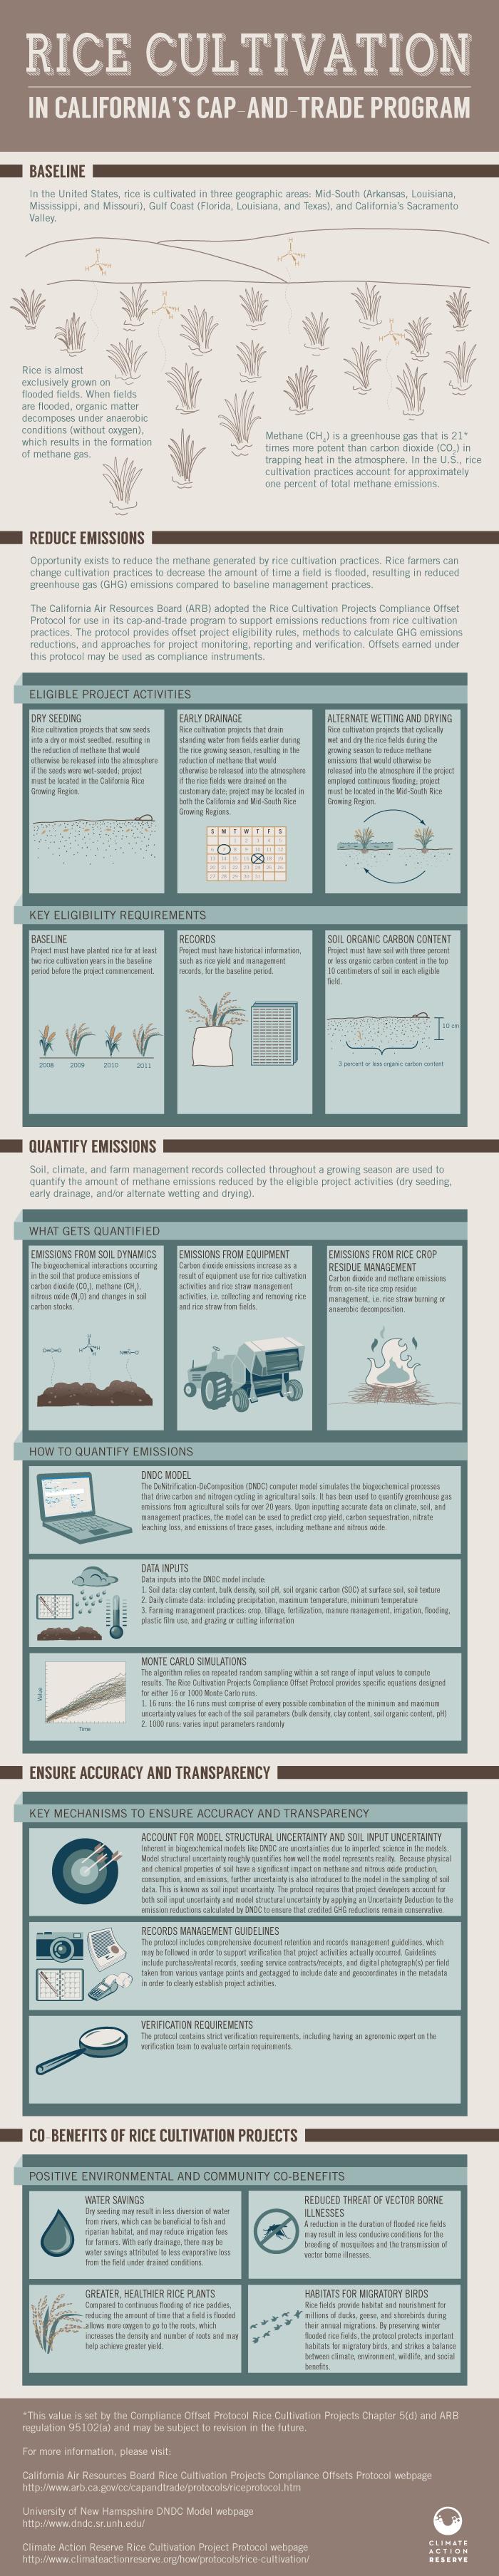 infographic-rice7